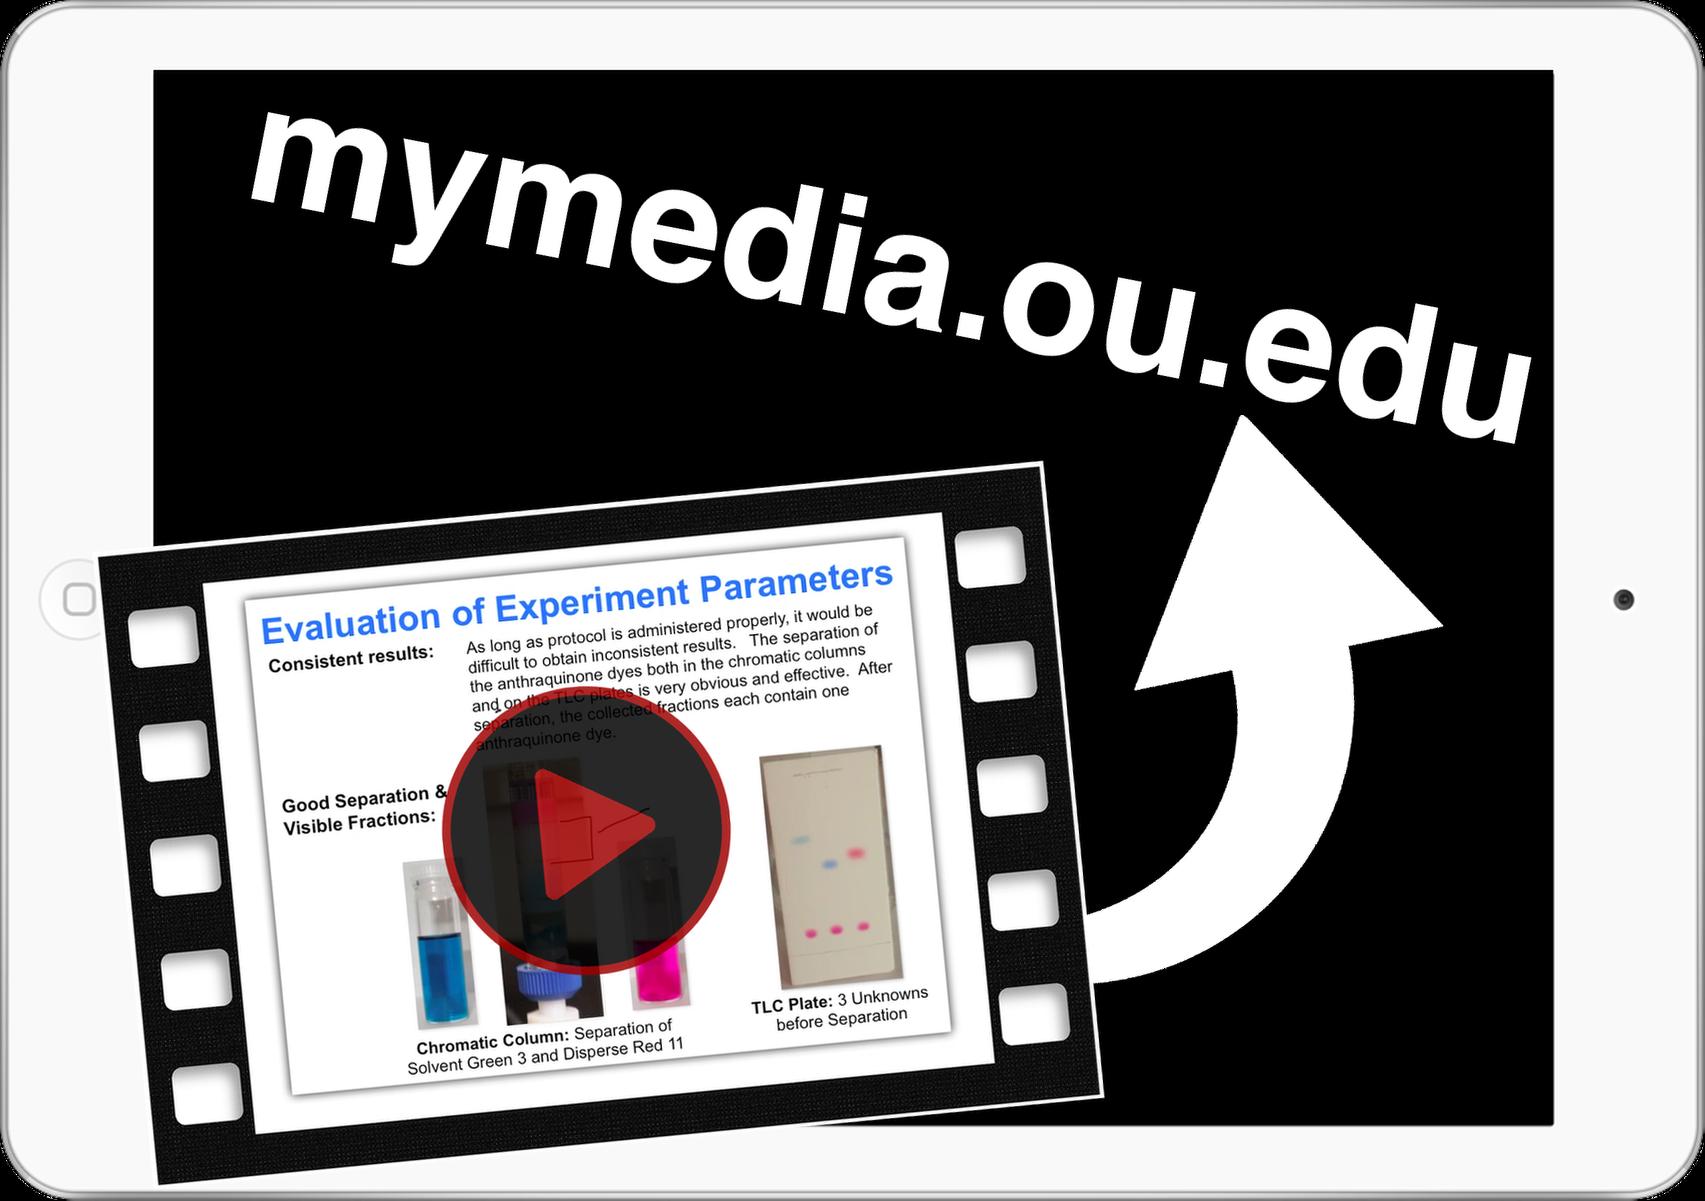 mymedia.ou.edu